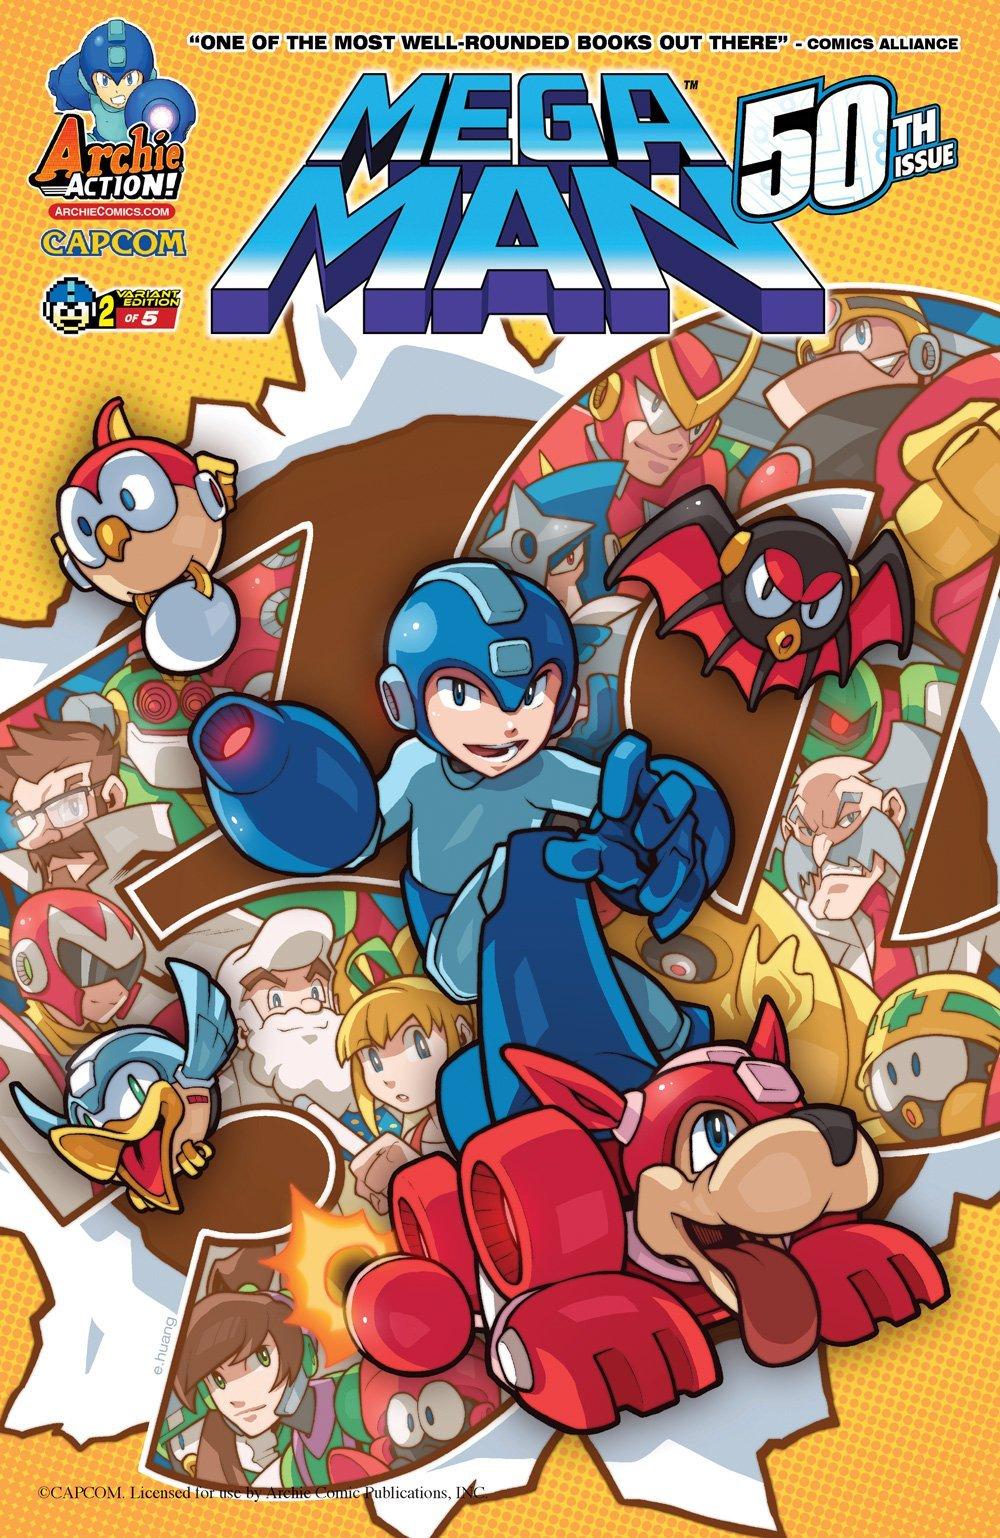 Mega Man 050 (August 2015) (variant 2)